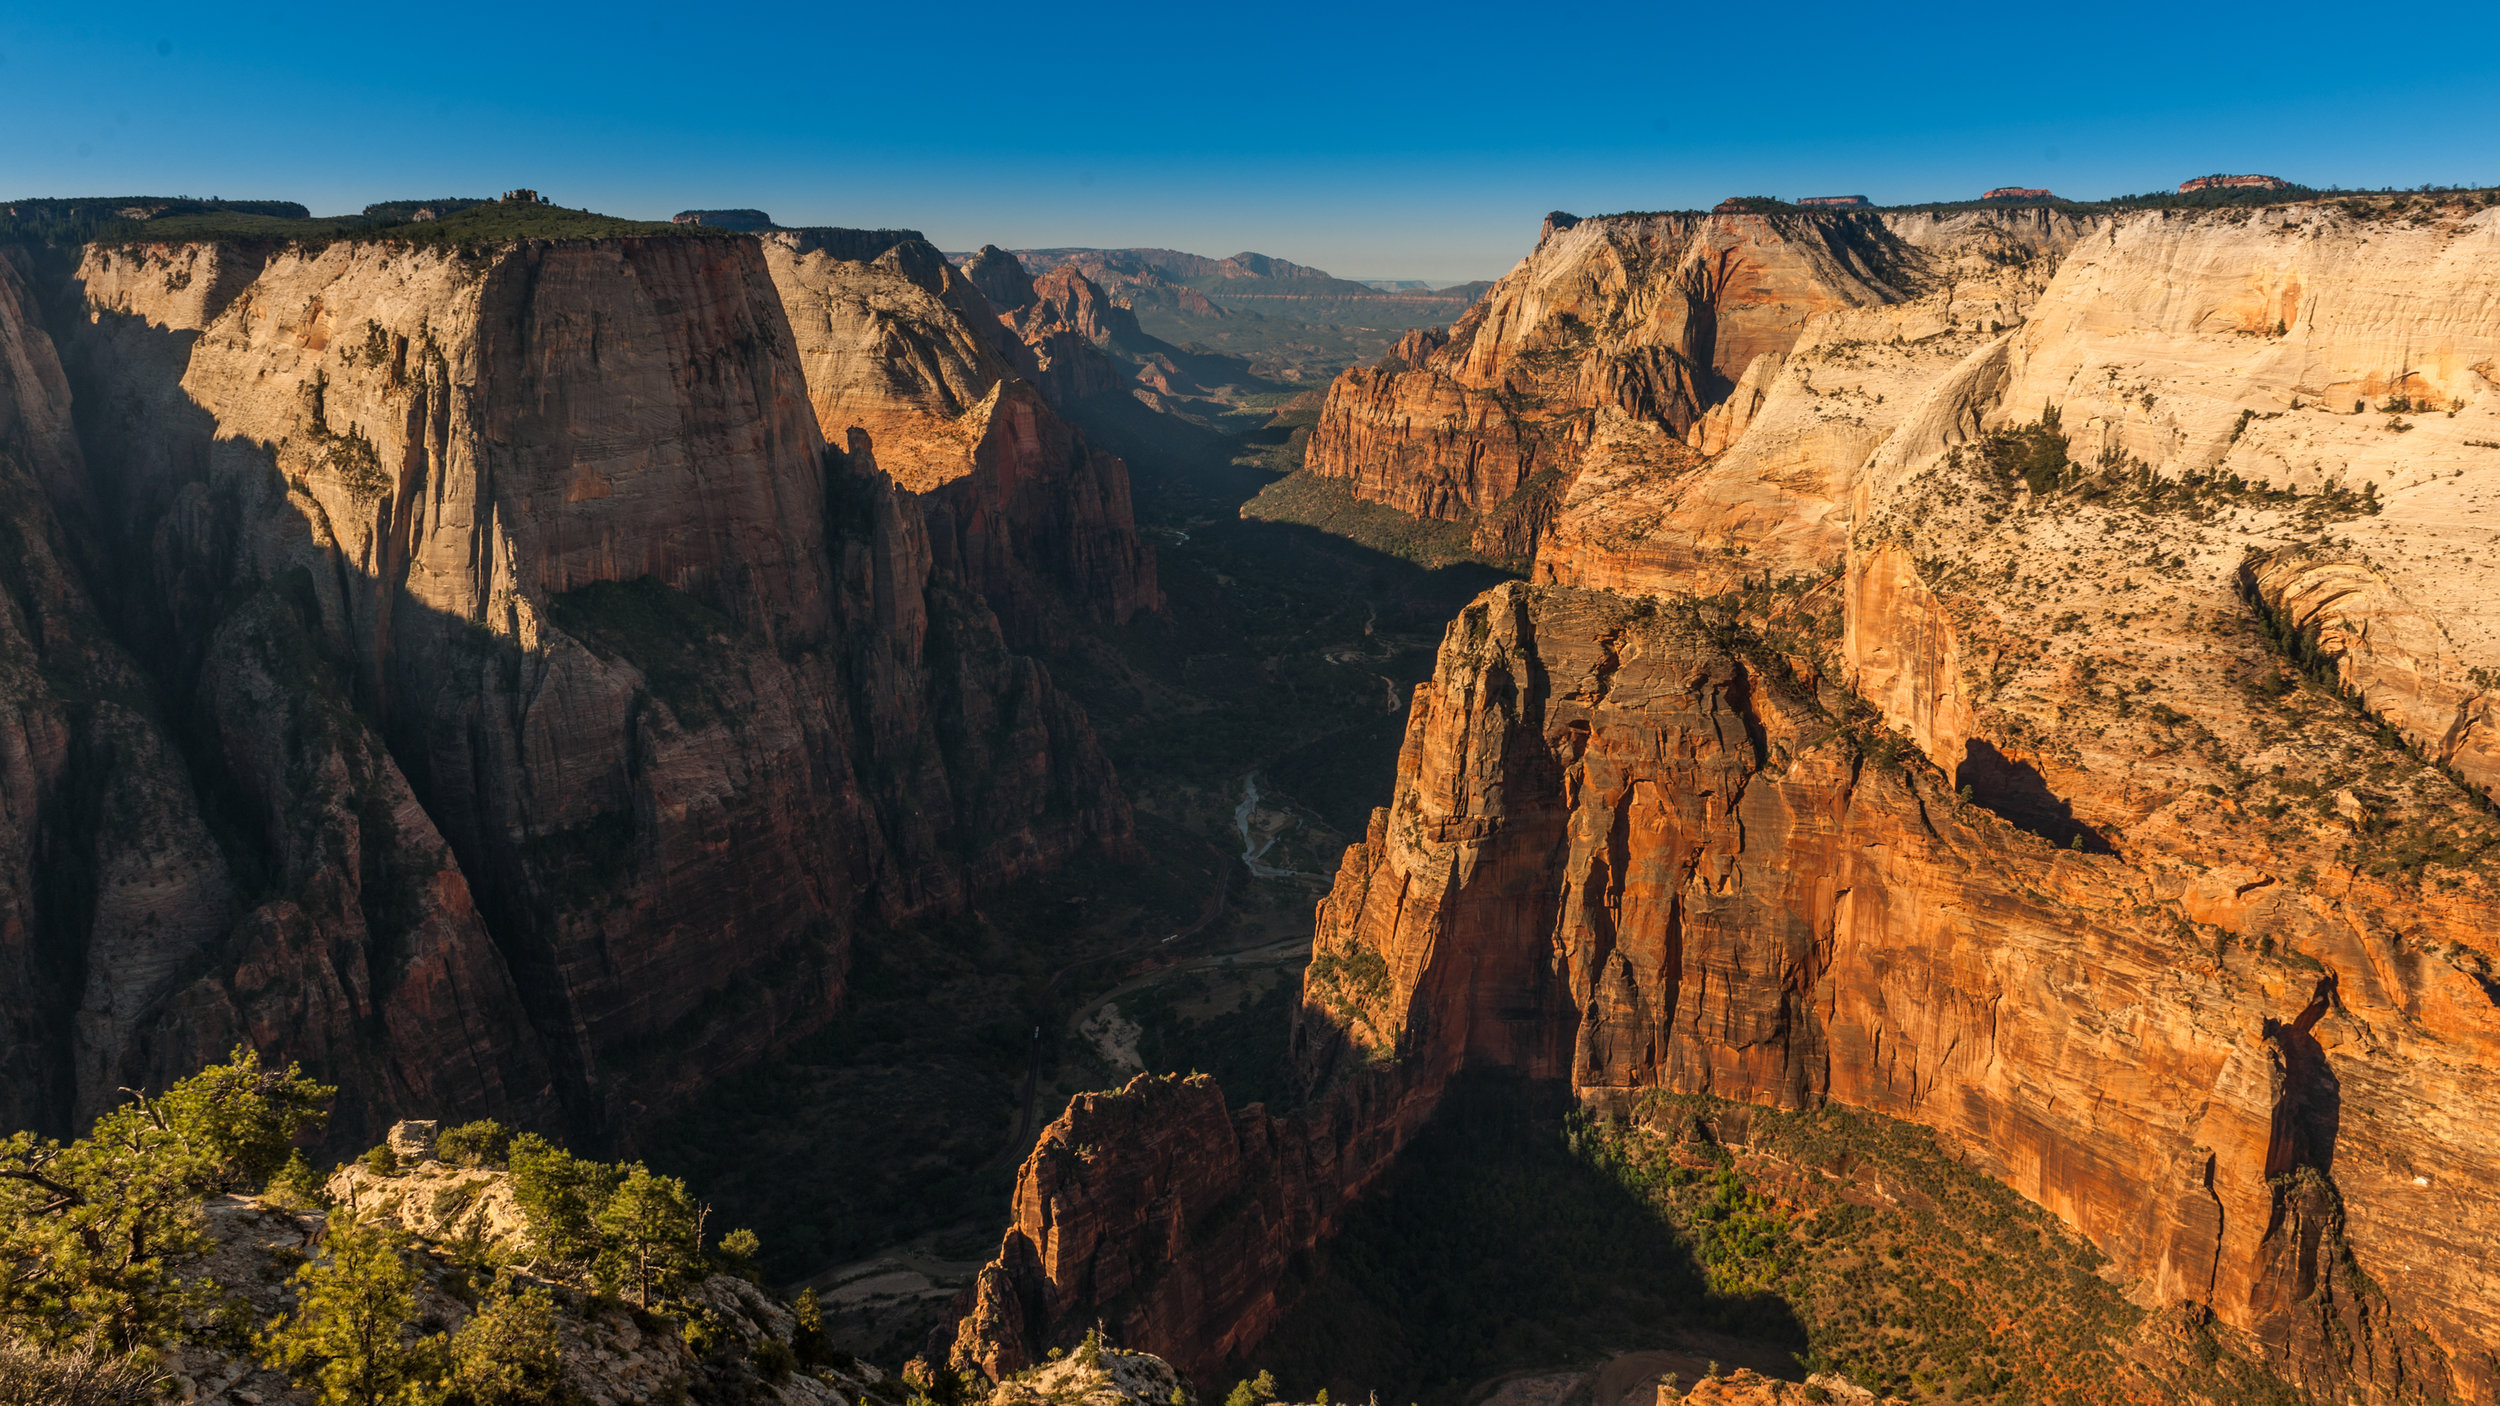 Observation point, Zion National Park